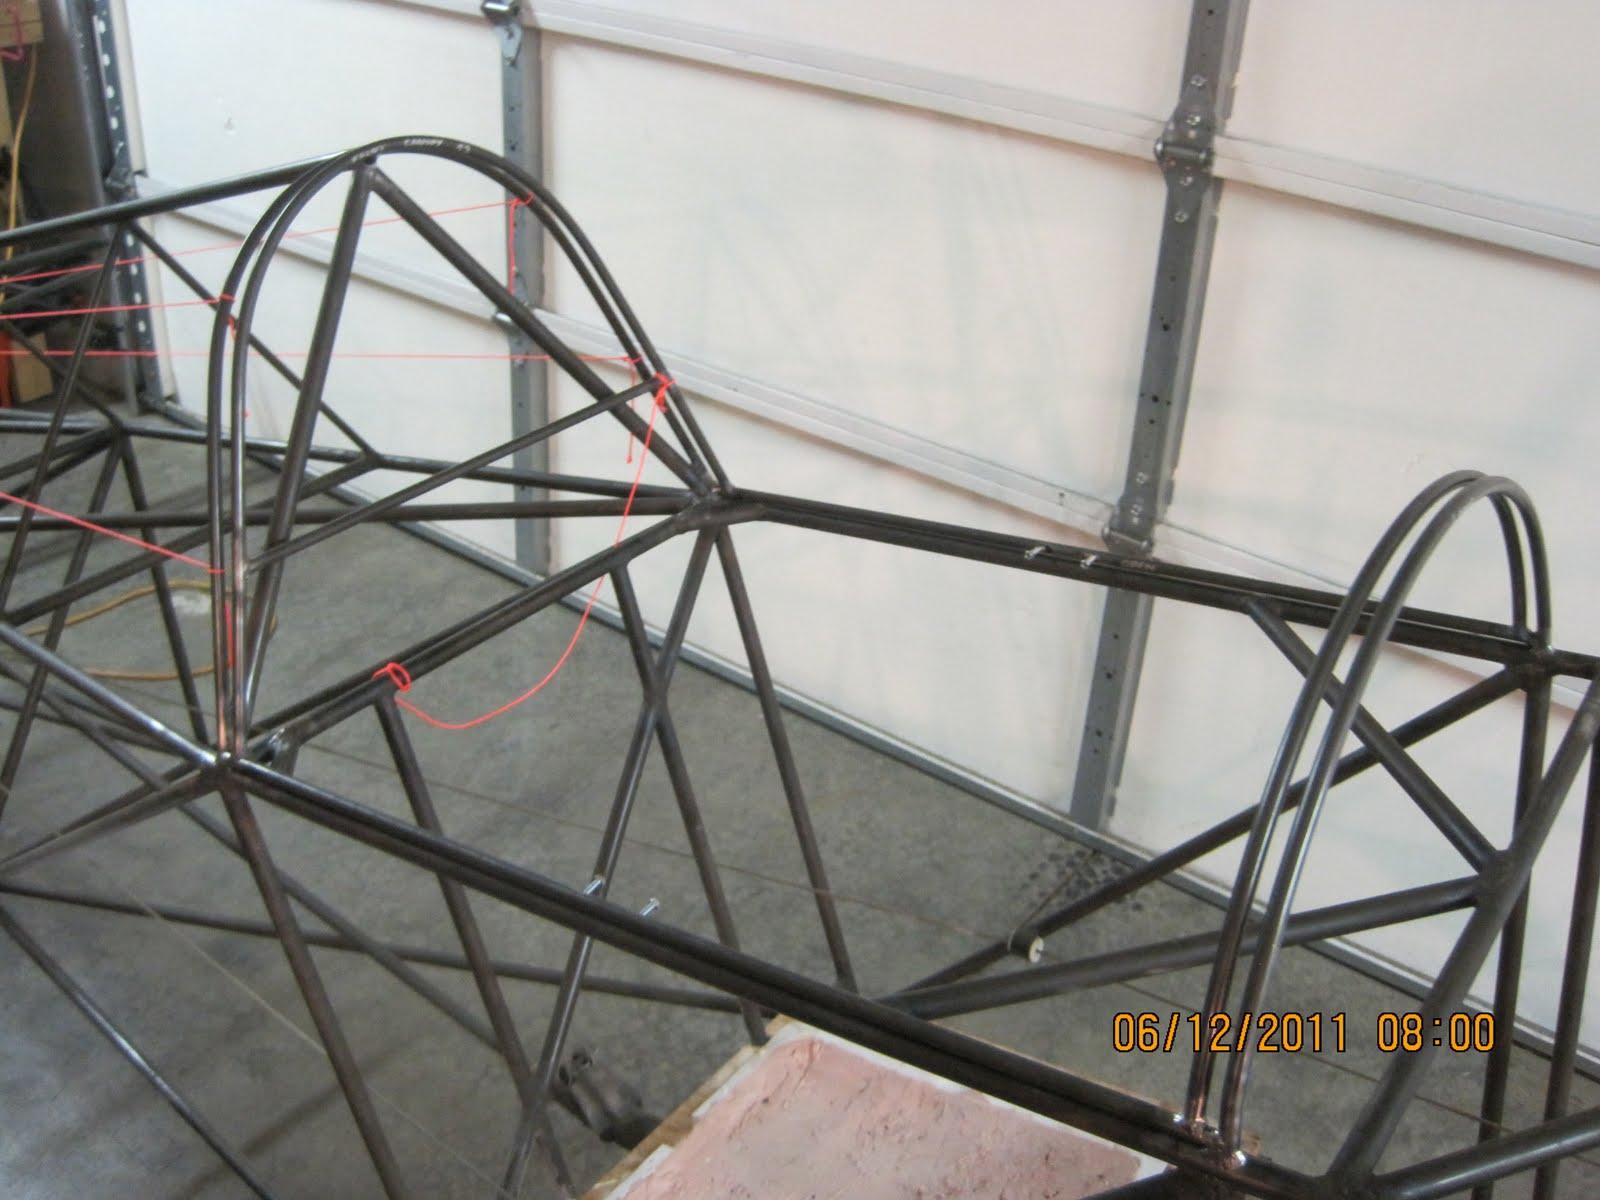 Sonerai 1 formula vee racer: Canopy frame